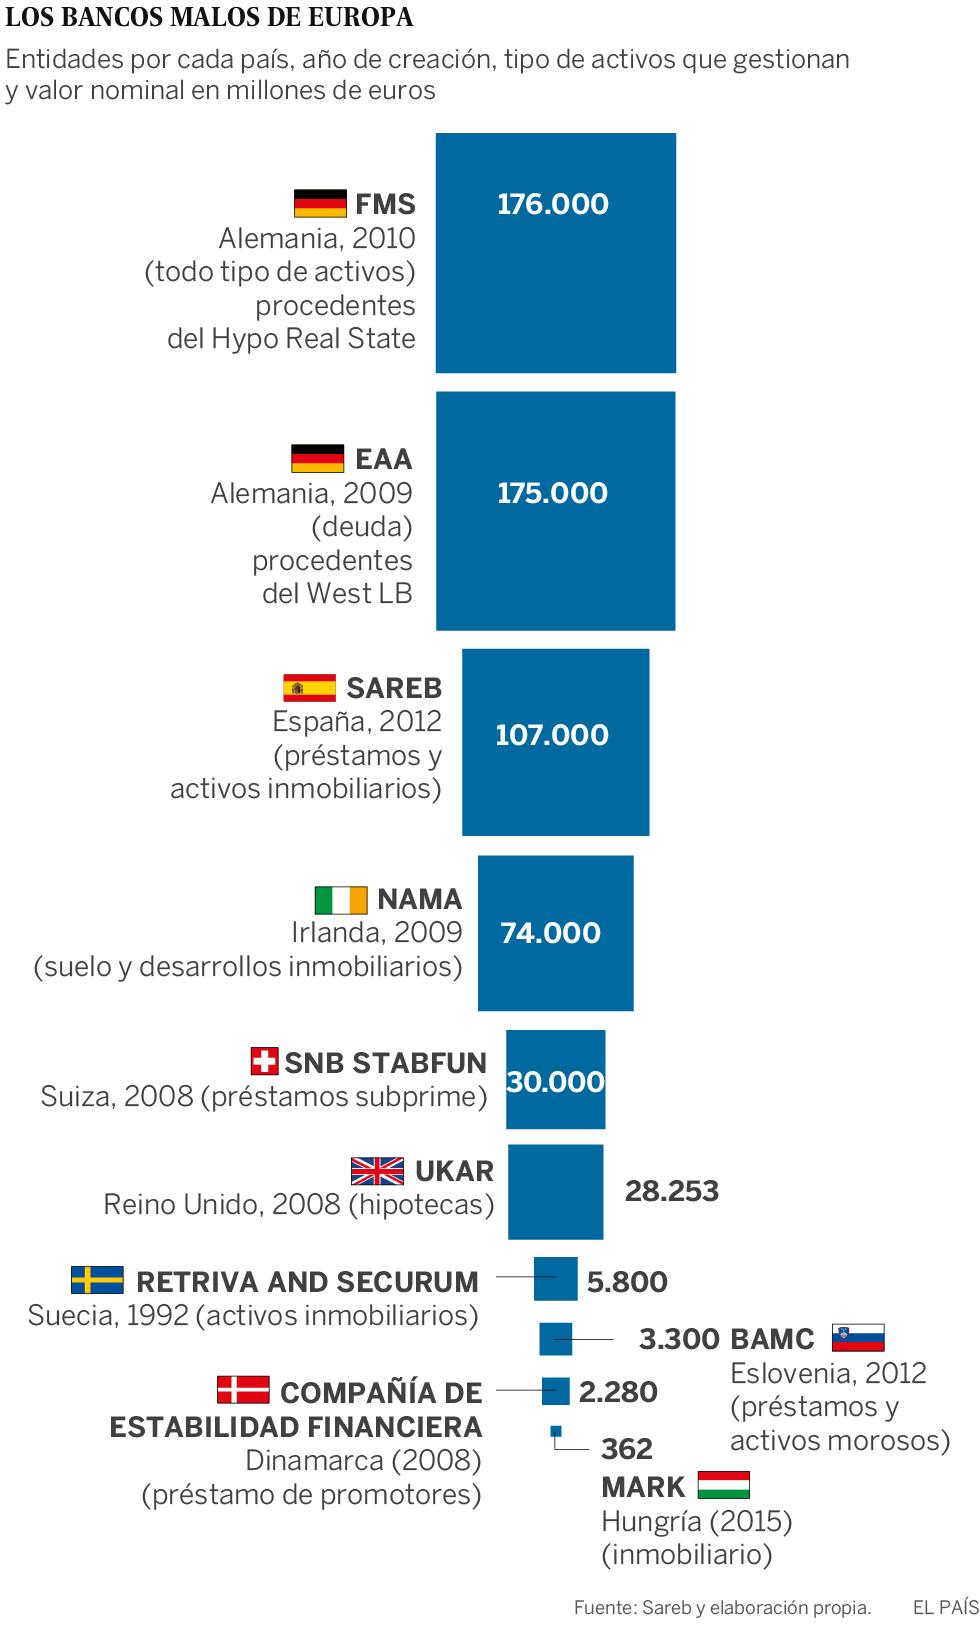 Banco malo a nivel europeo